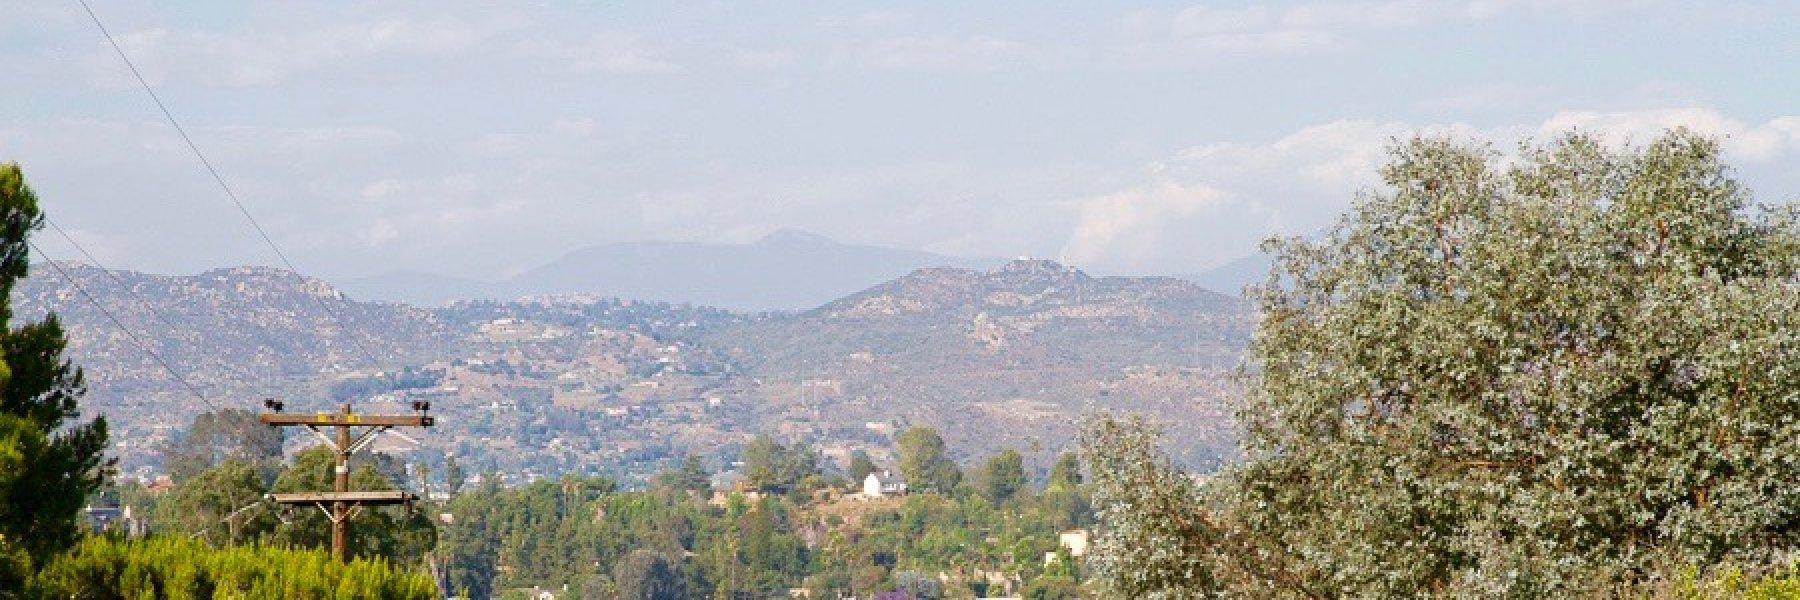 Horizon Hills Community of Home in El Cajon